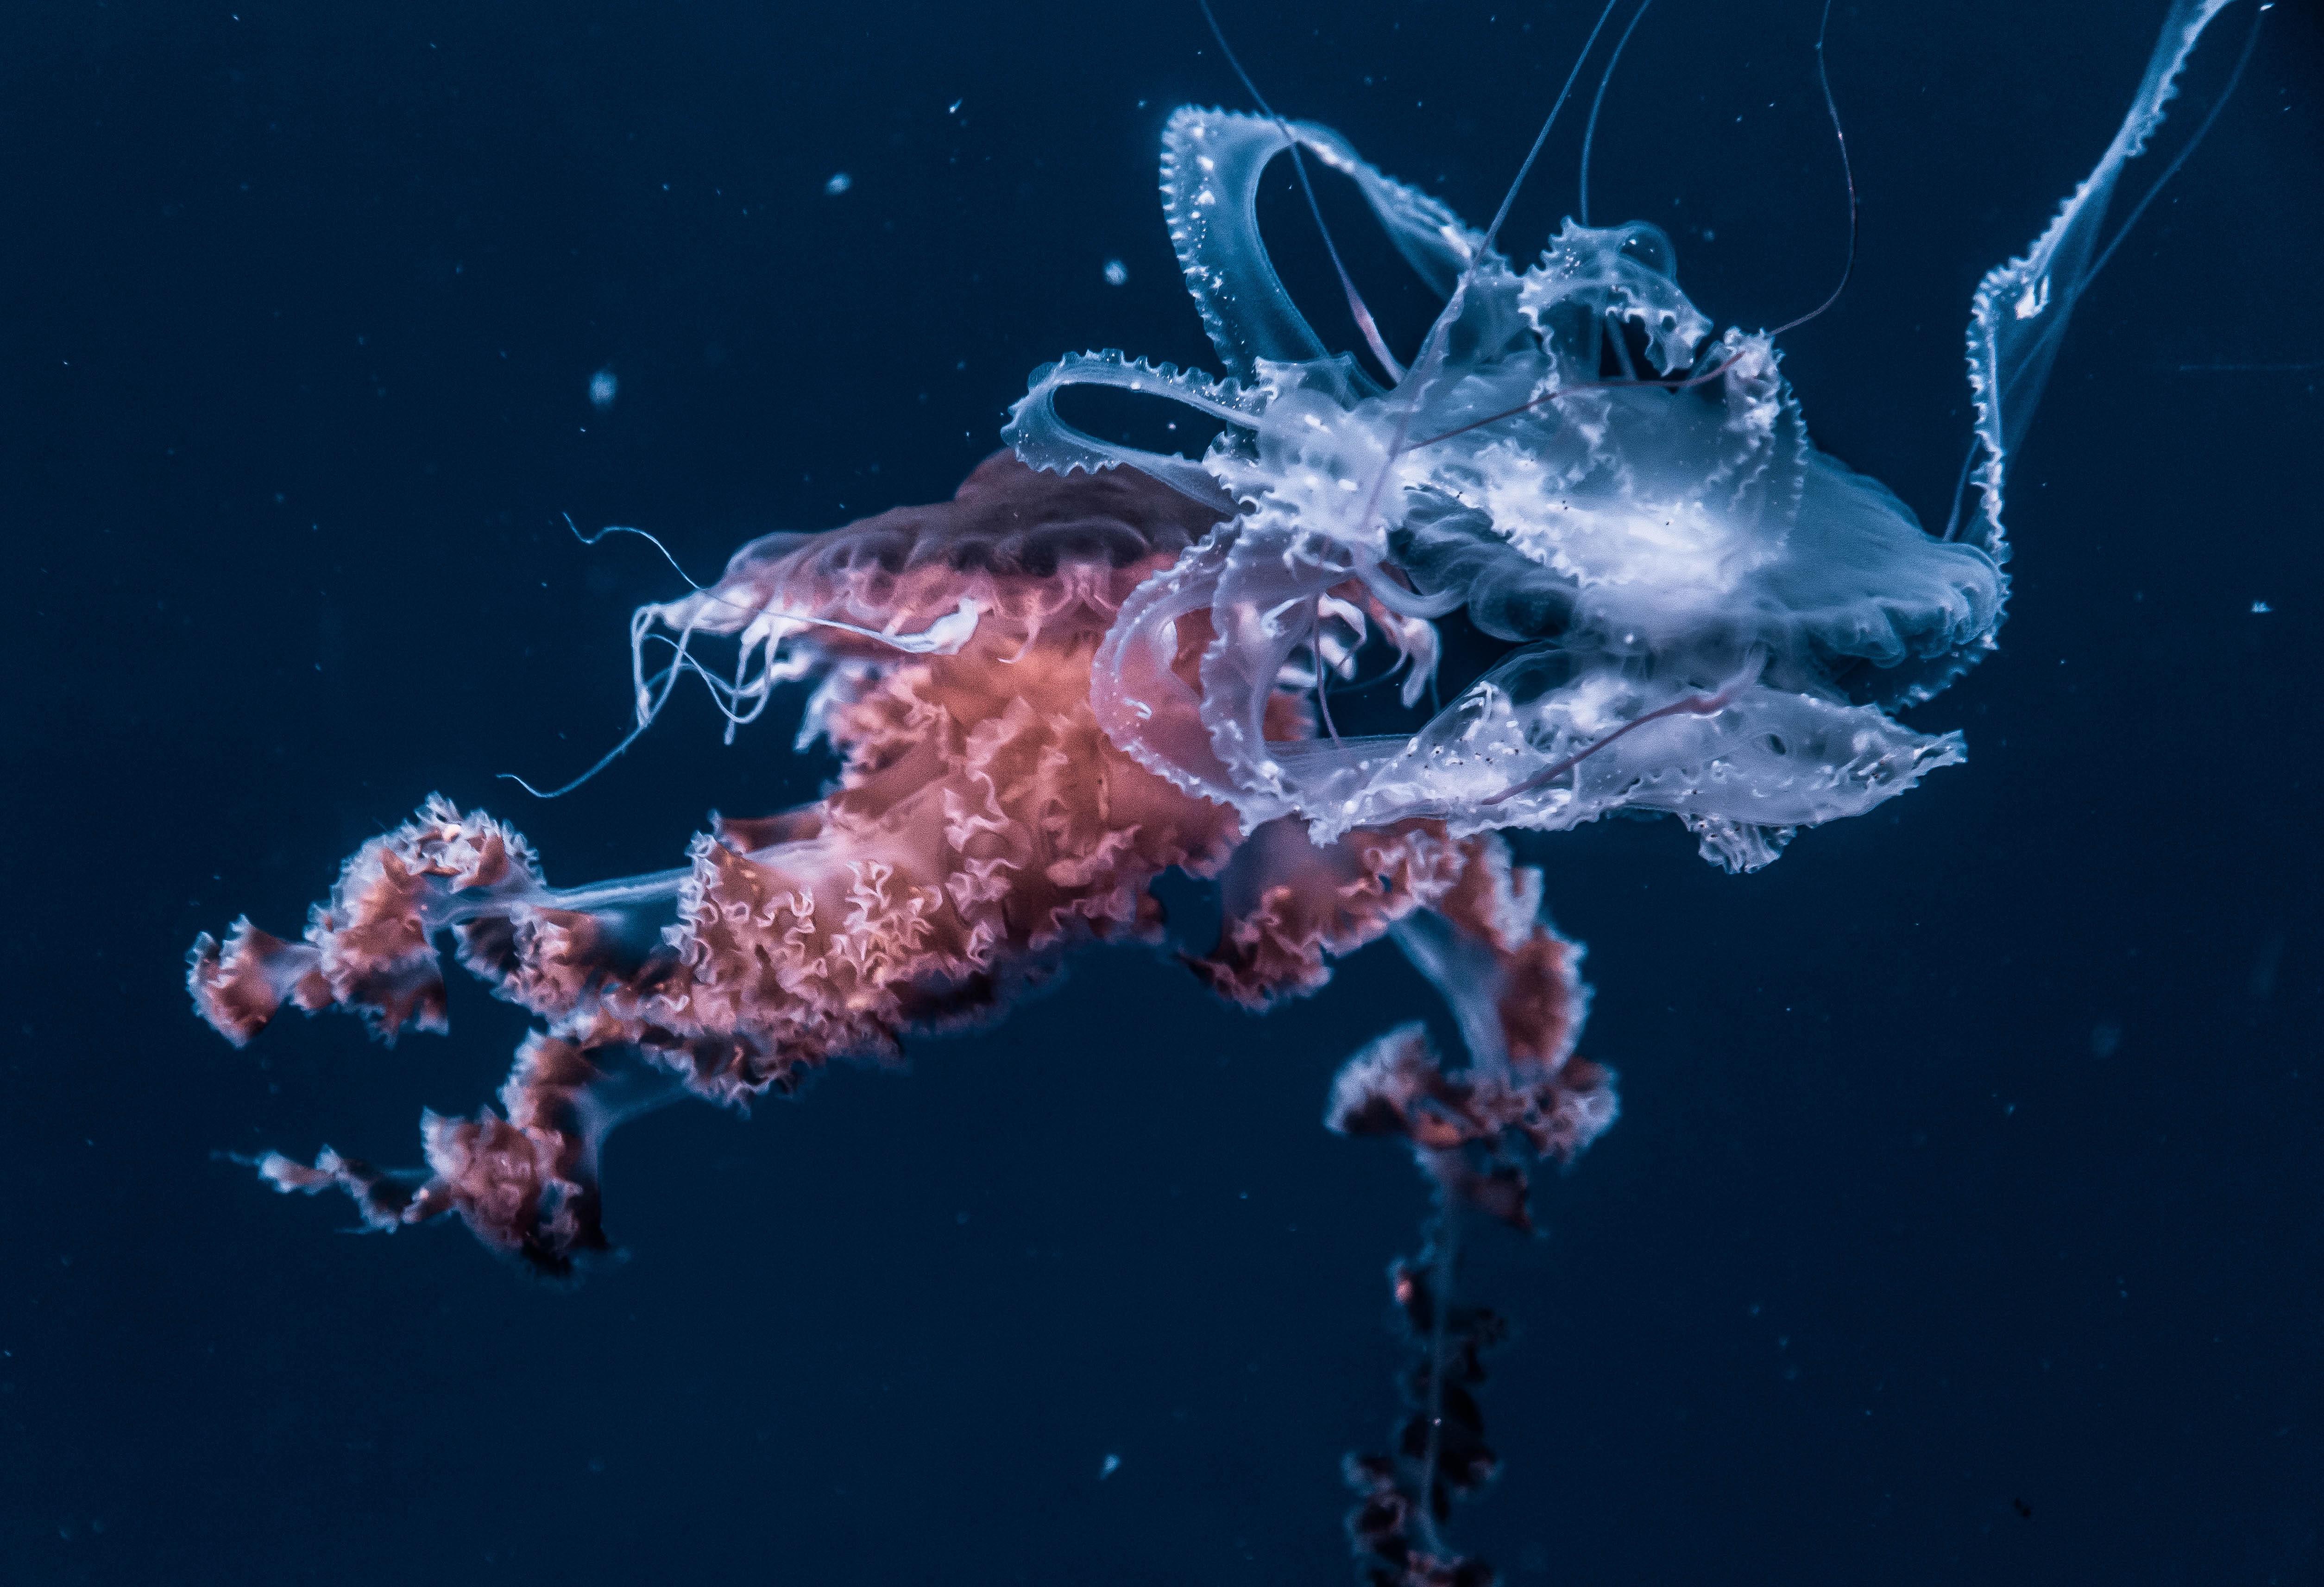 free images underwater invertebrate reef zooplankton